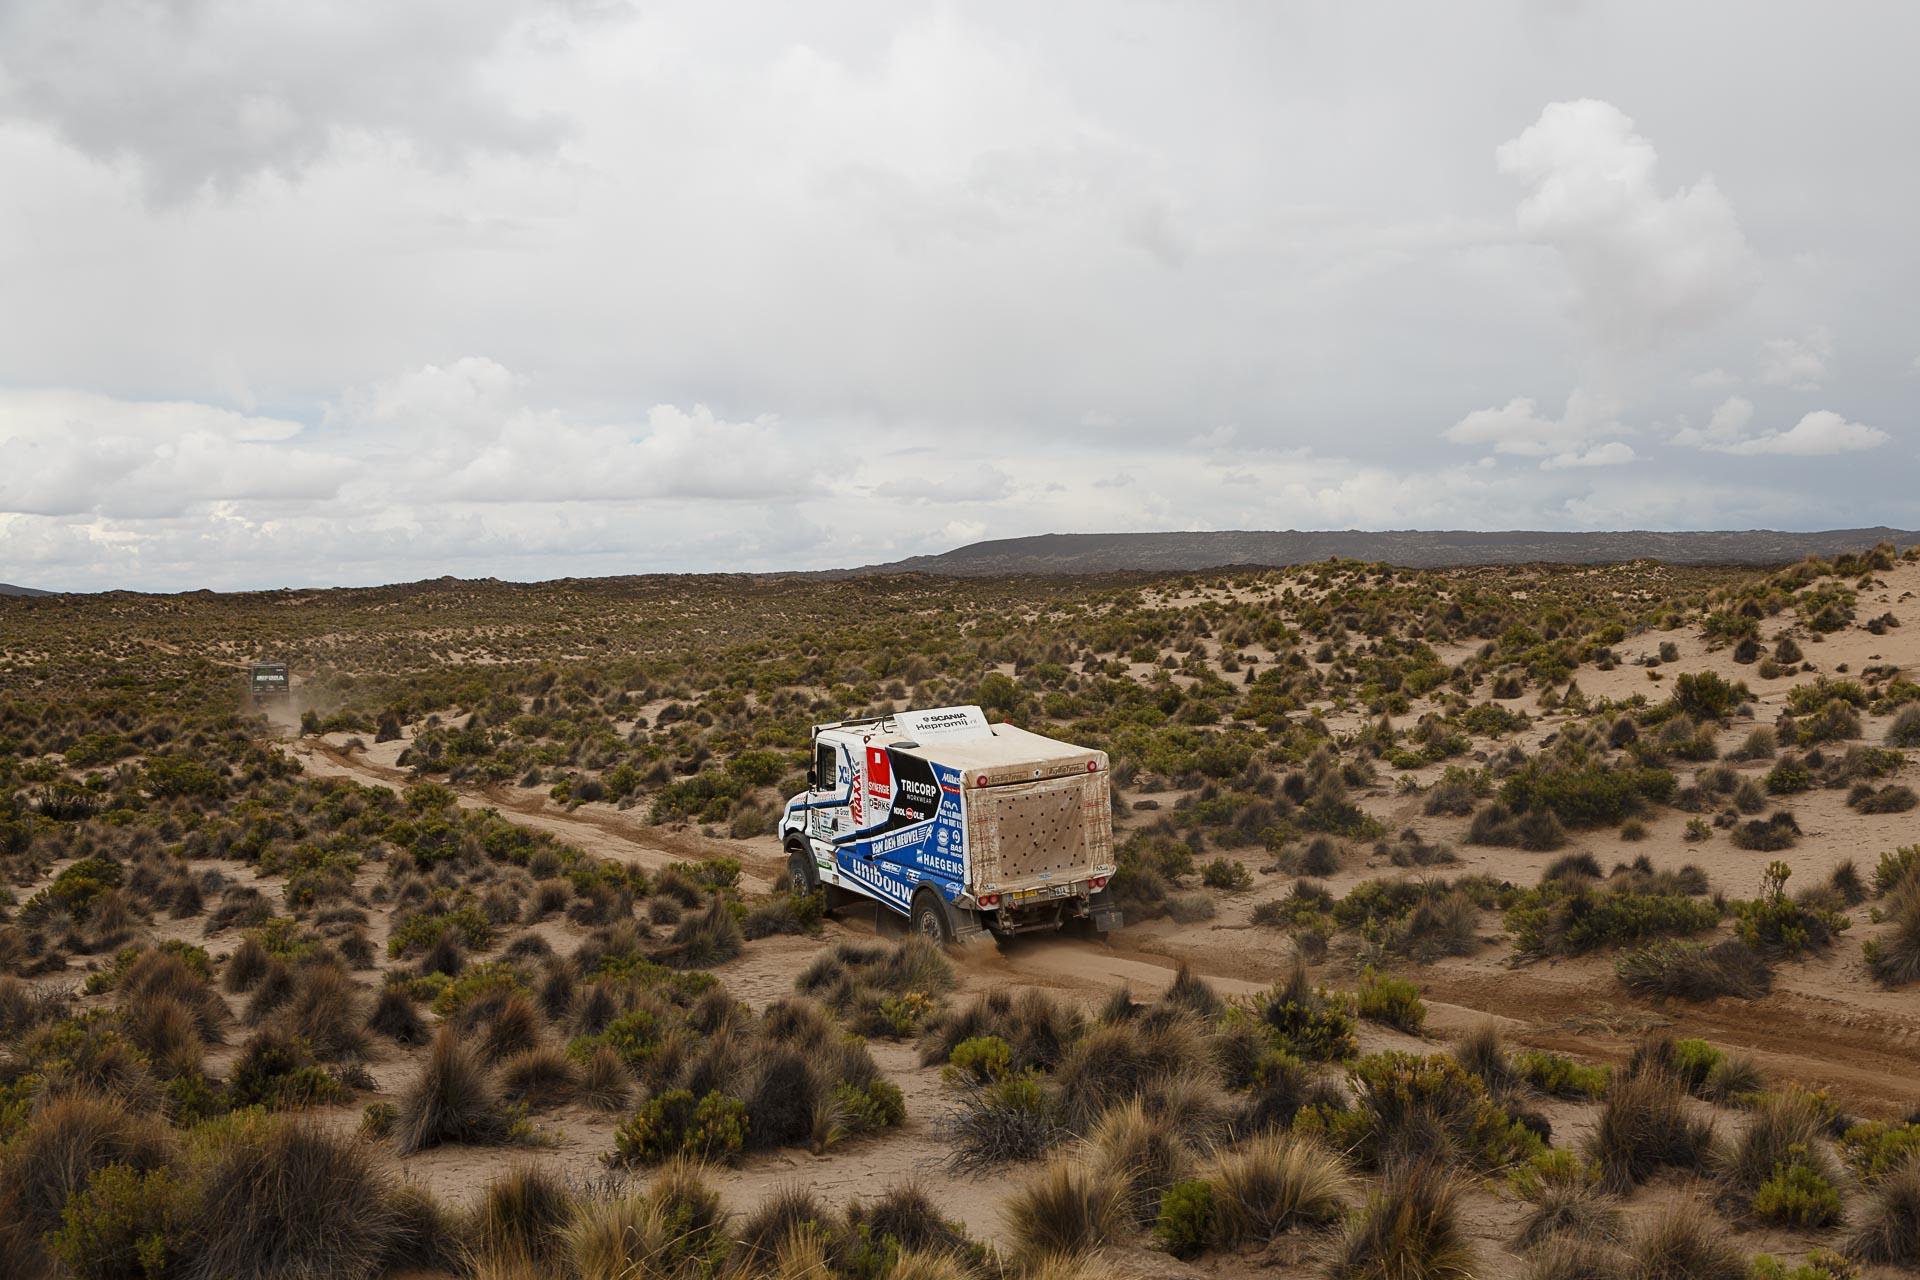 Dakarspeed: etappe 8 Uyuni - Salta